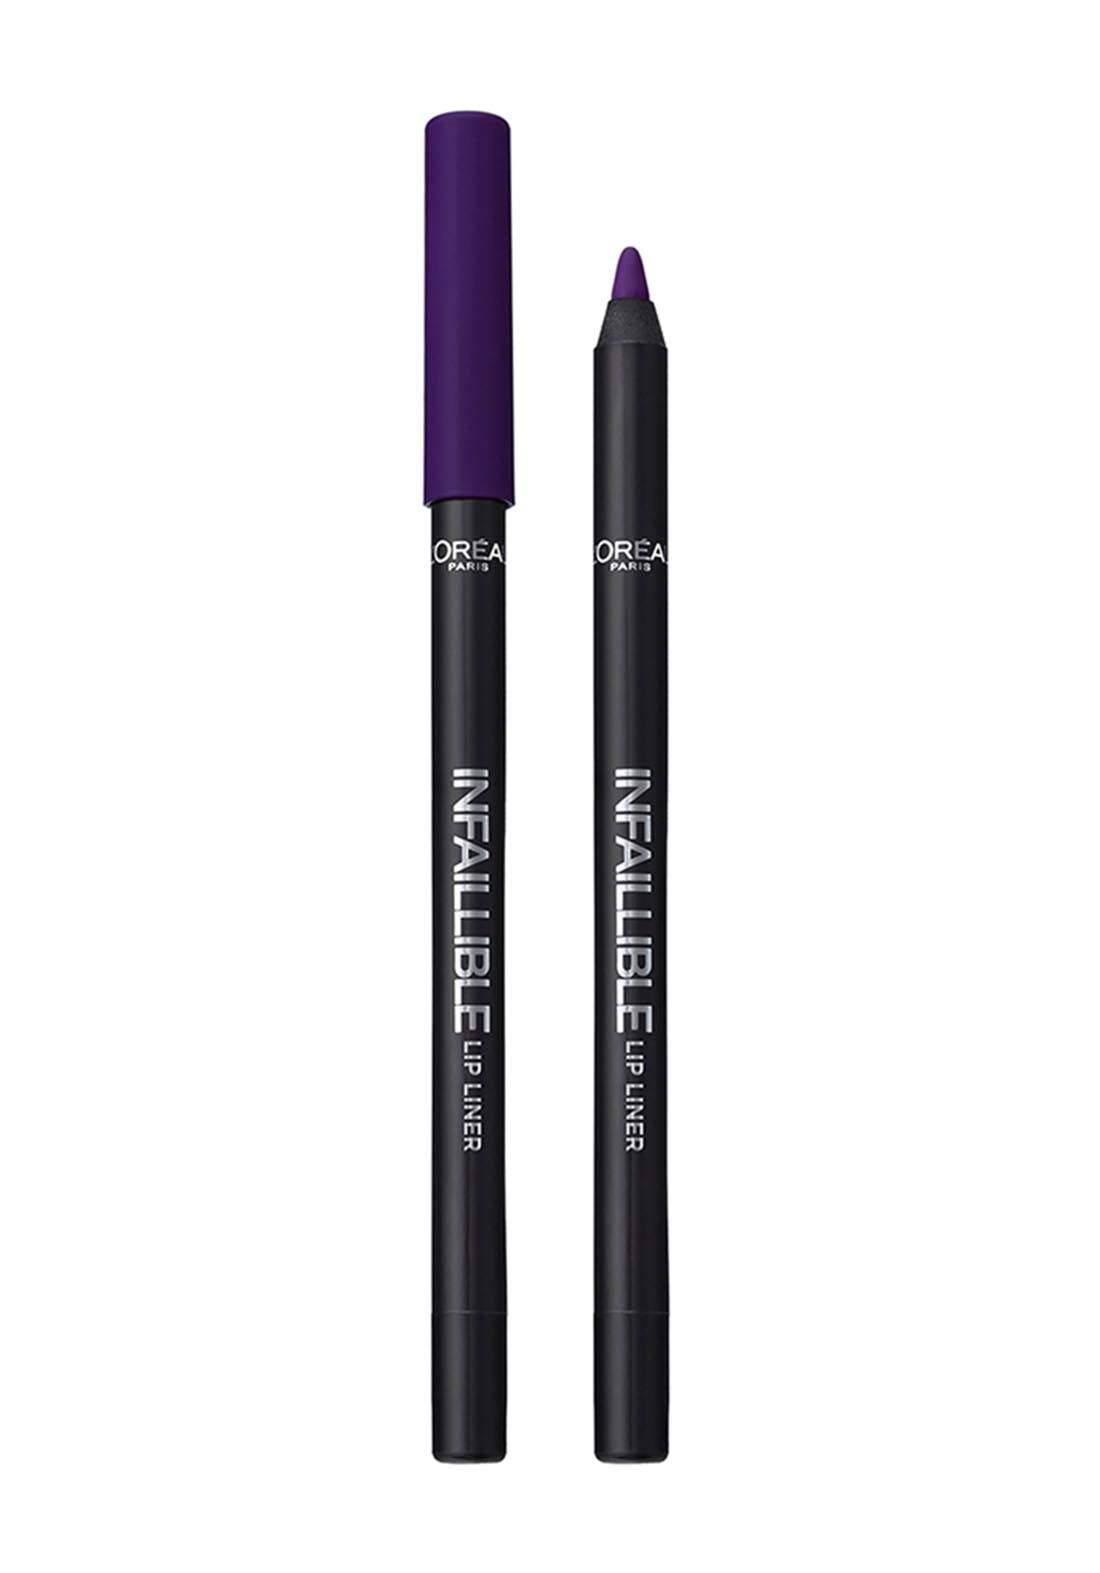 L'Oreal Paris Infallible Lip Liner 107 Dark River (027-0976) قلم محدد للشفاه